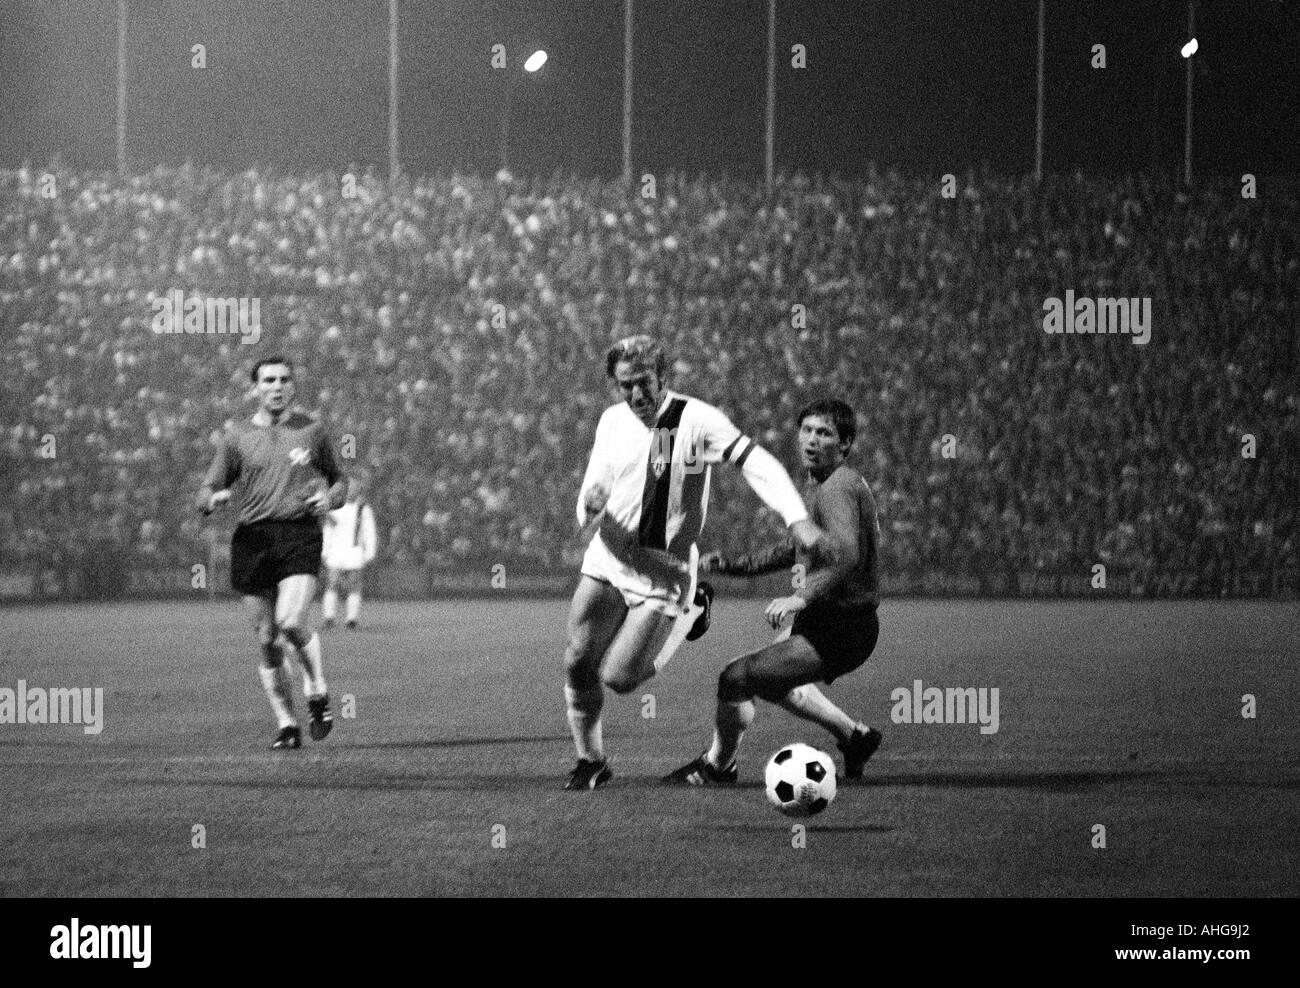 football, Bundesliga, 1970/1971, Borussia Moenchengladbach versus Hanover 96 0:0, Boekelberg Stadium, scene of the match, f.l.t.r. Claus Brune (96), Guenter Netzer (MG), Hans Josef Hellingrath (96) - Stock Image